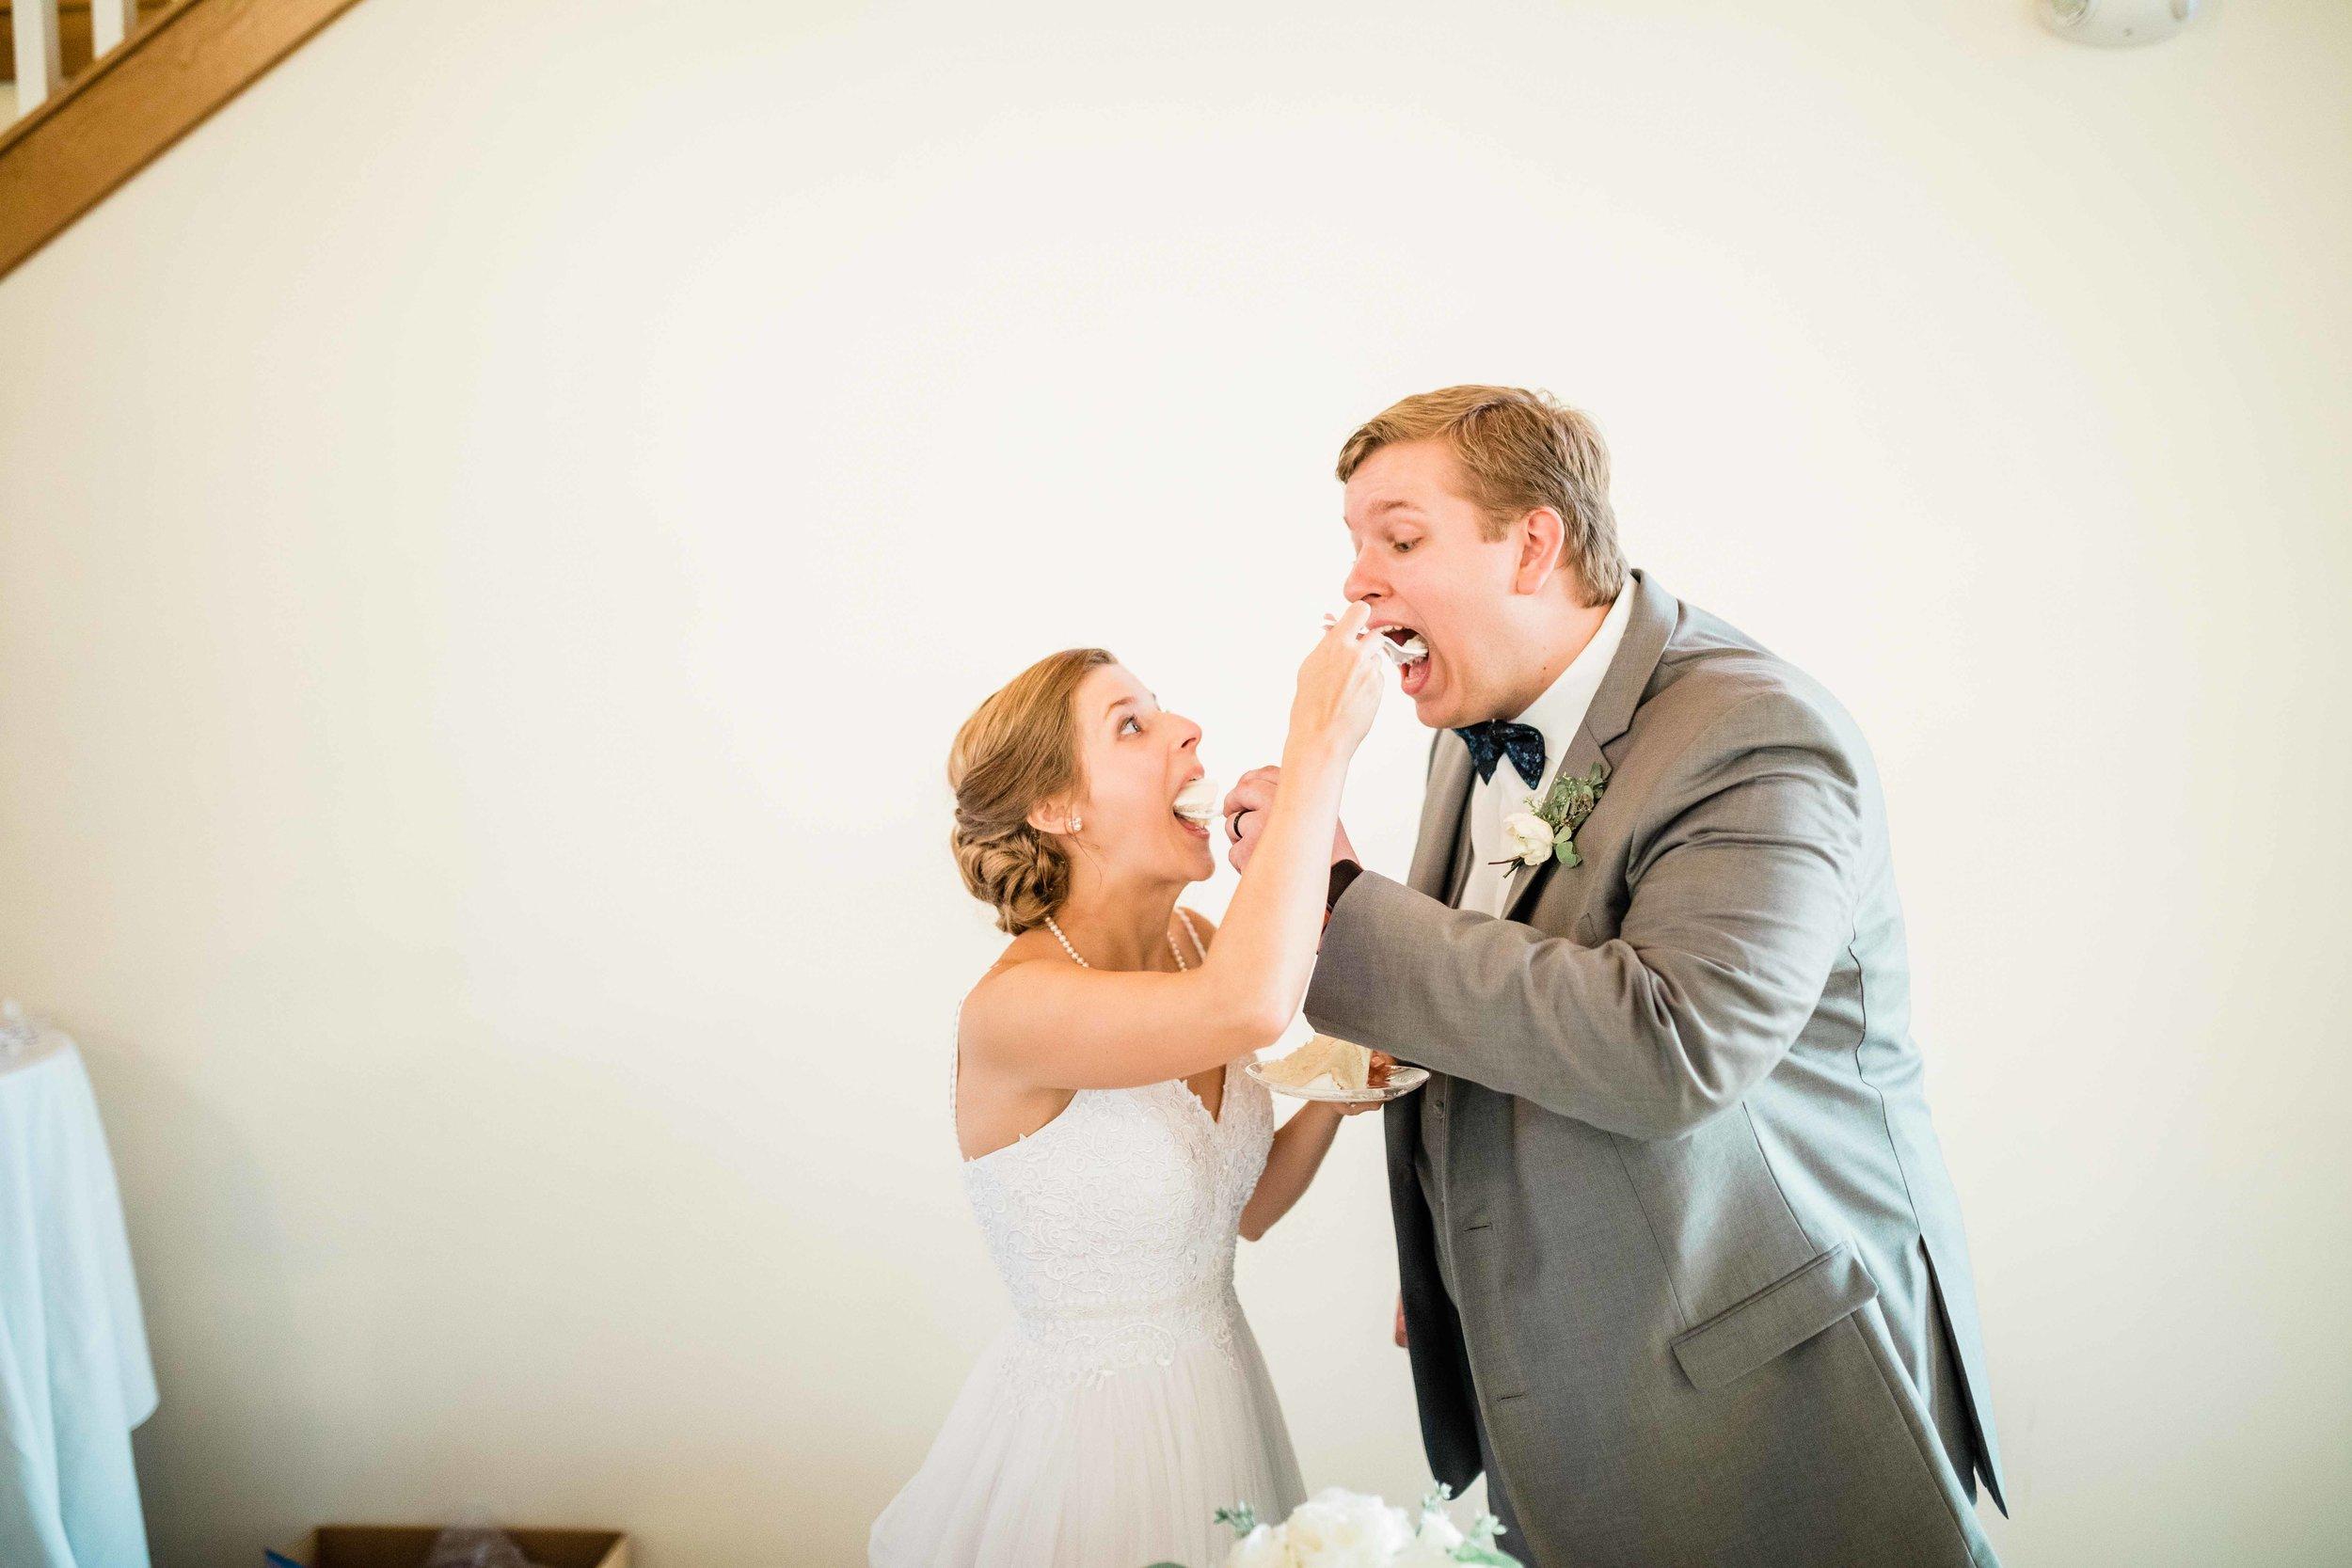 rosewood manor miamisburg wedding photos-12.jpg